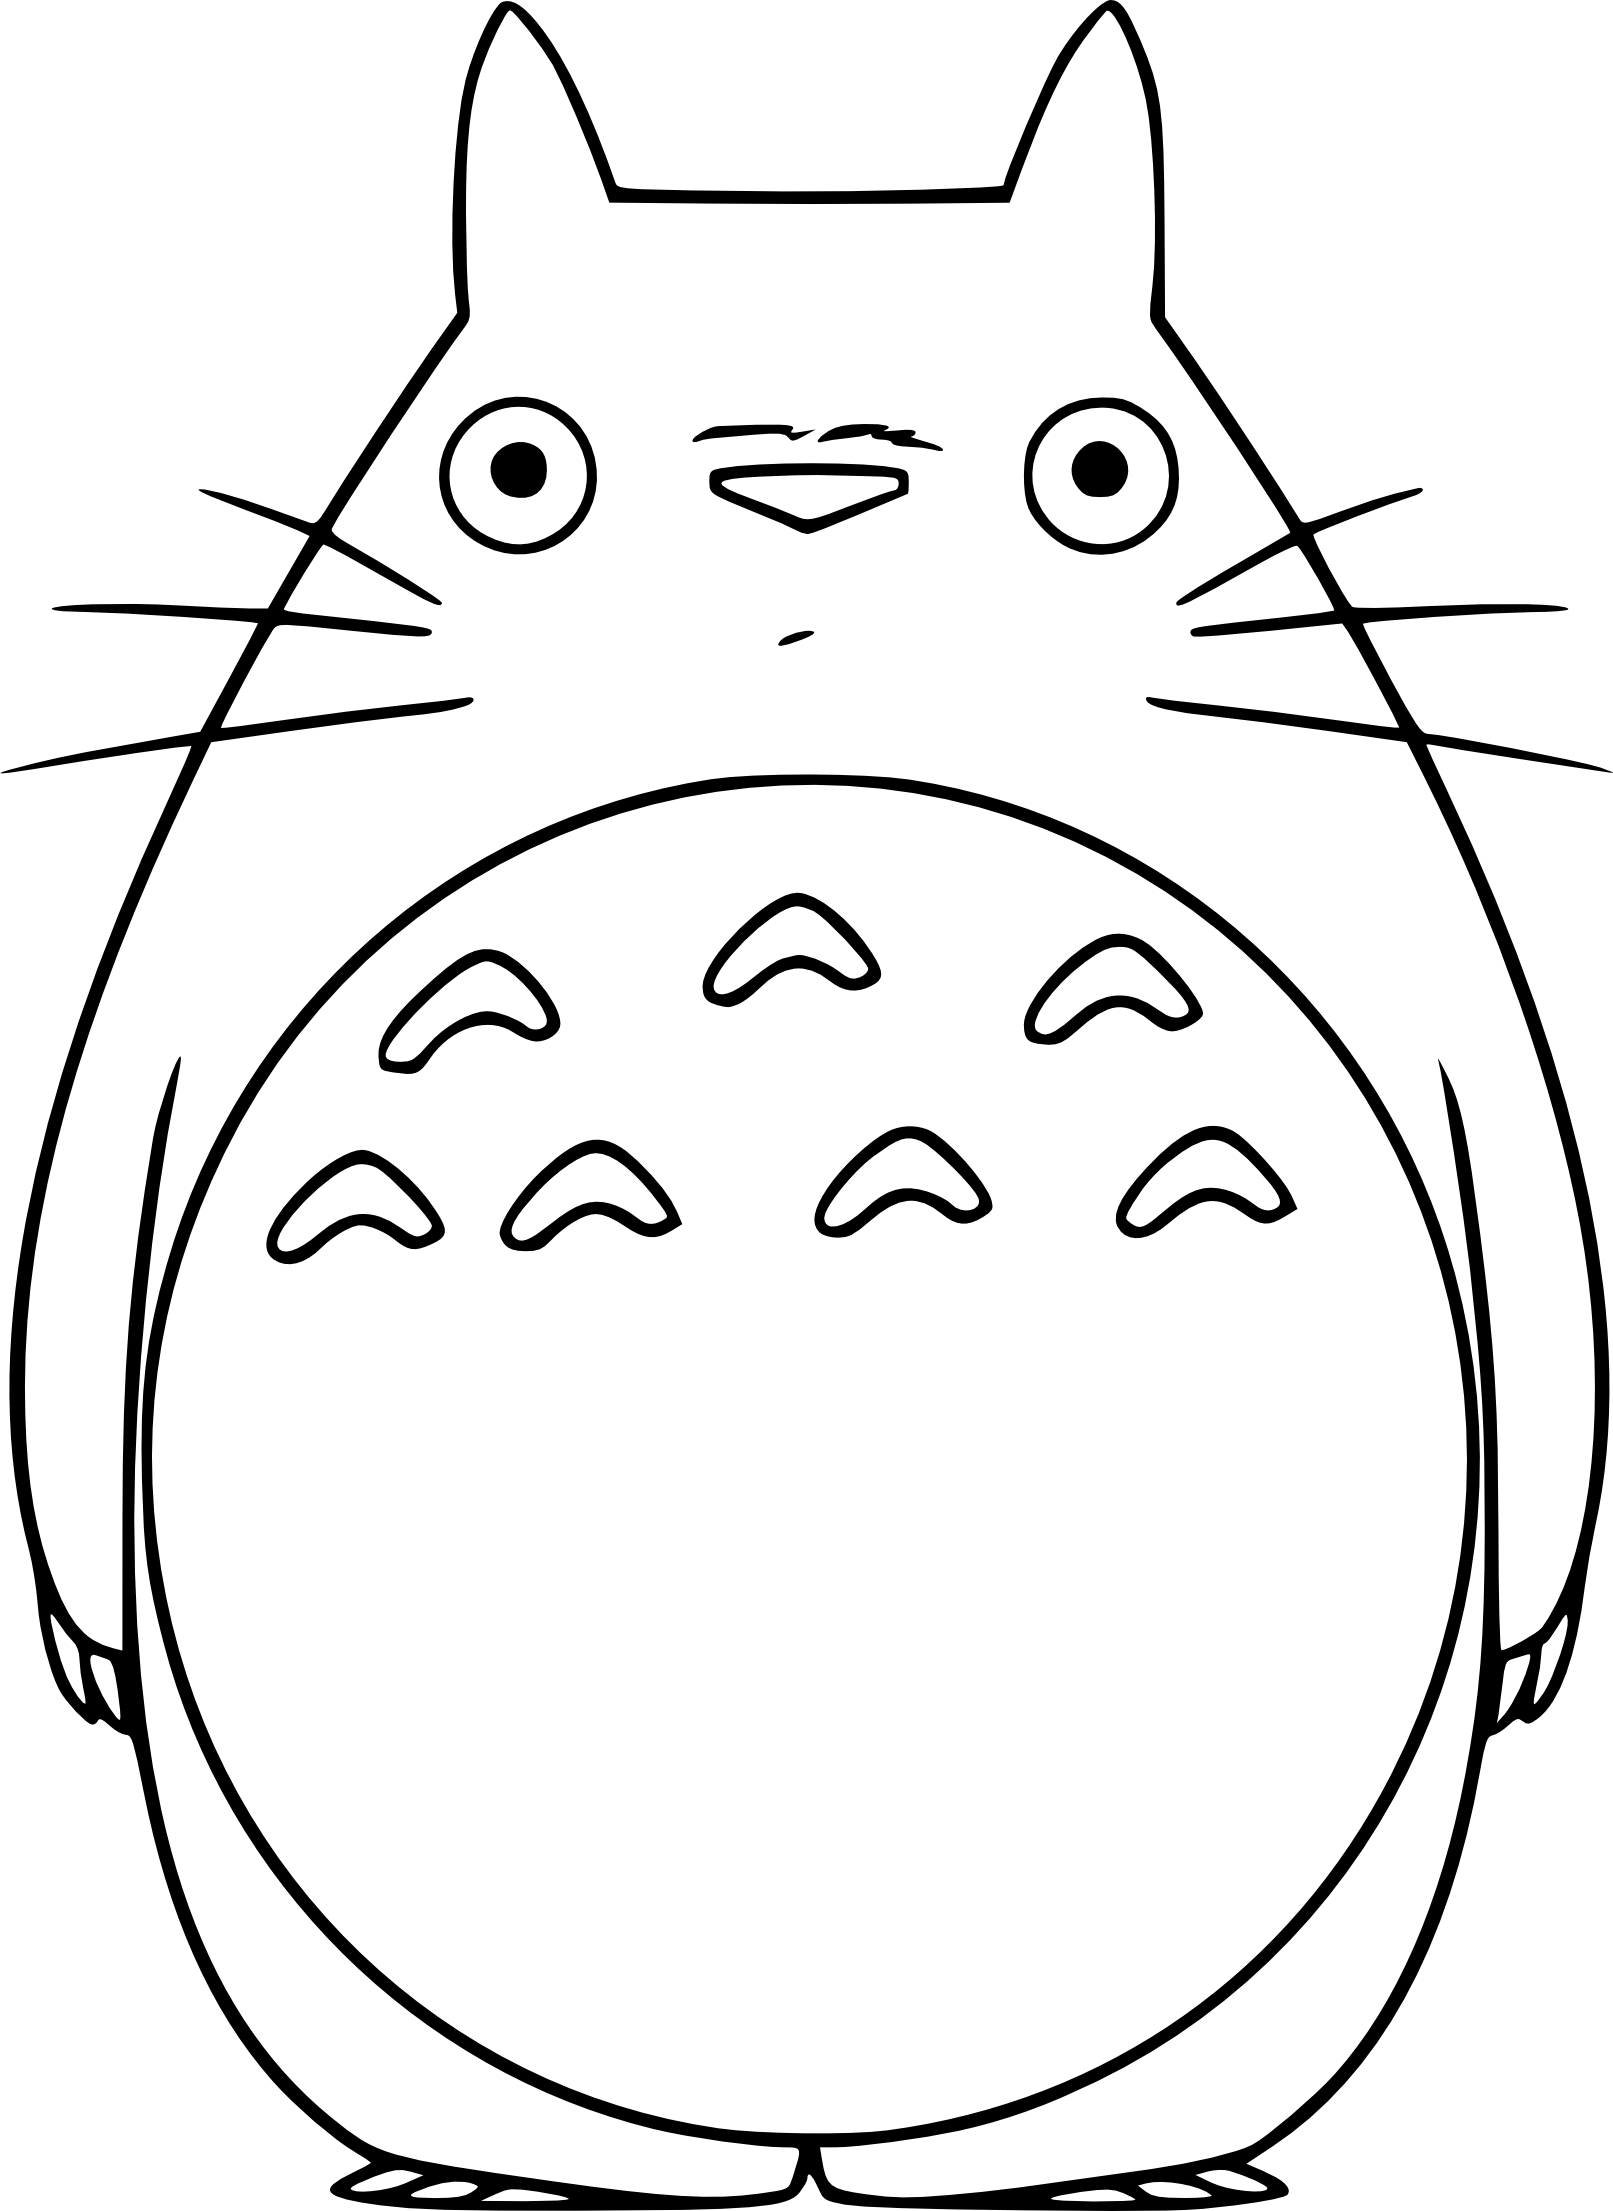 Coloriage Totoro